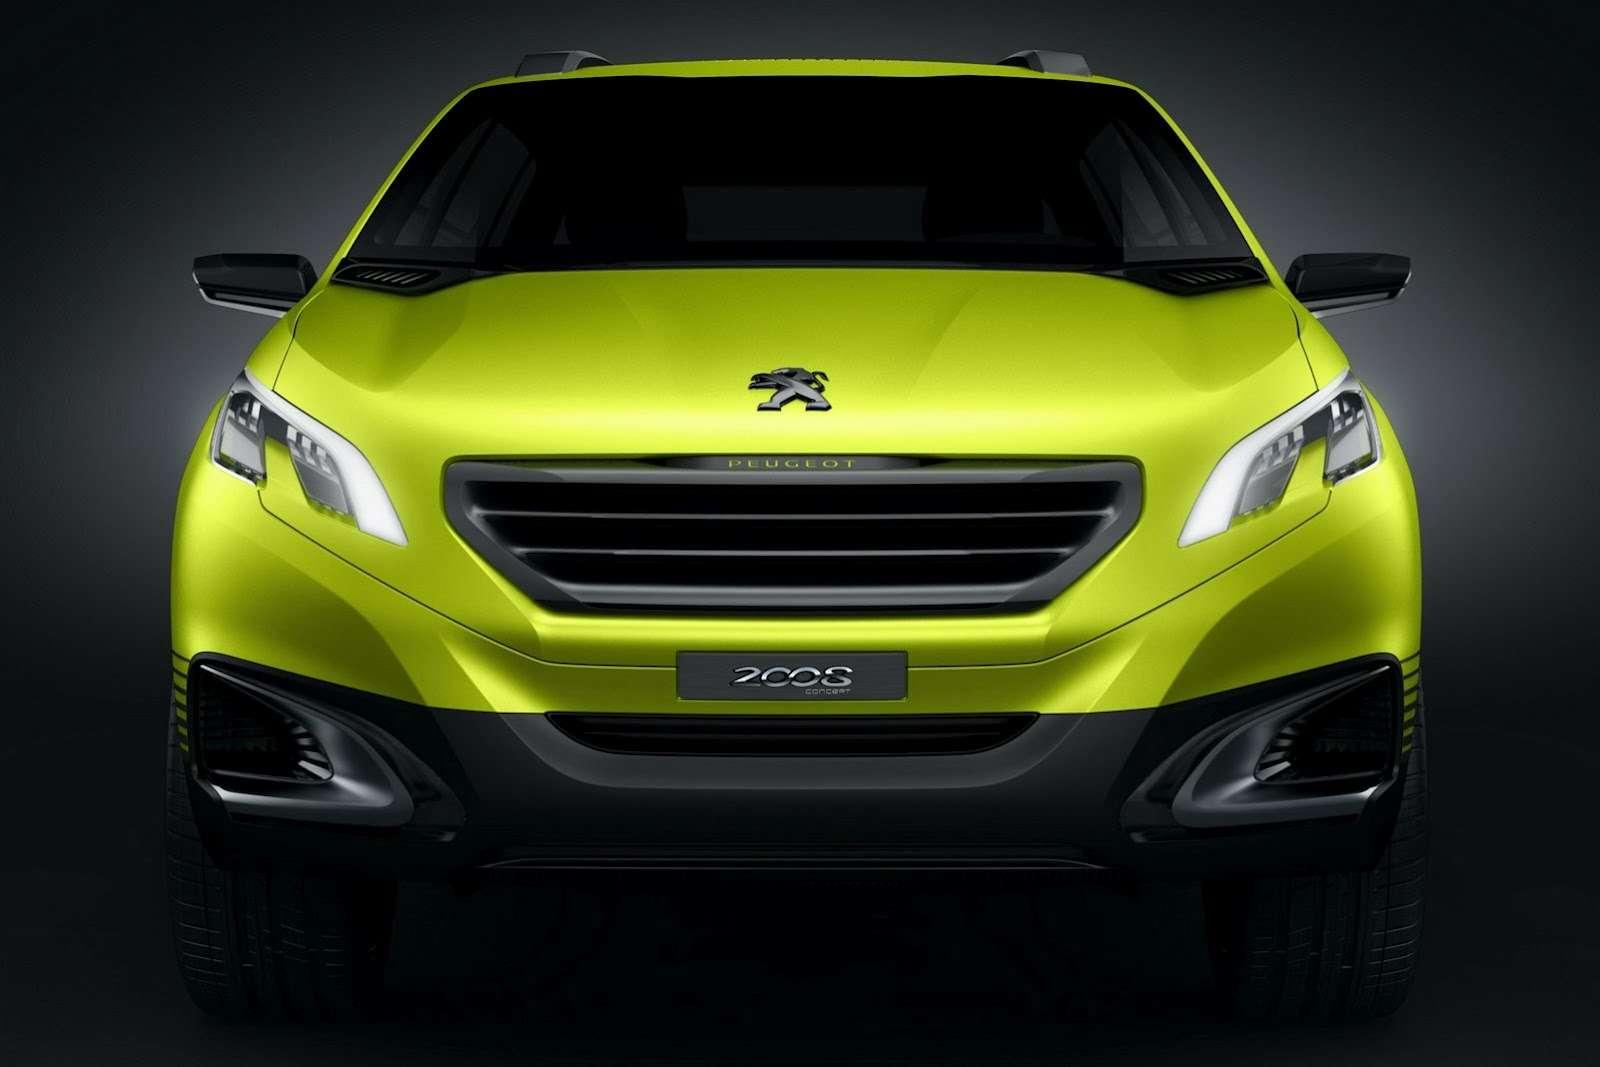 _no_copyright_Peugeot-2008-Concept-4